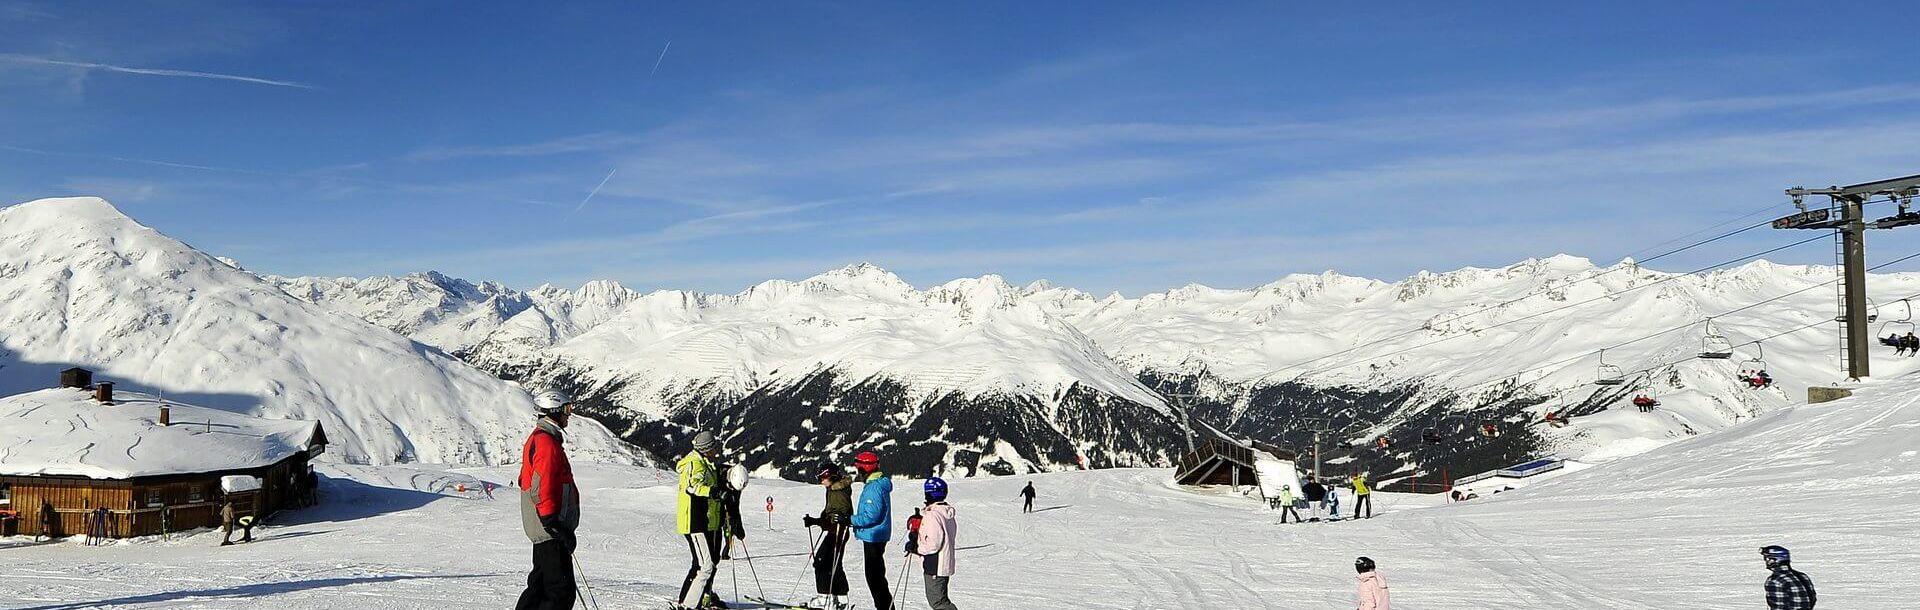 Skizentrum St. Jakob im Defereggental - OsttirolerLand.com   © TVB Osttirol St. Jakob